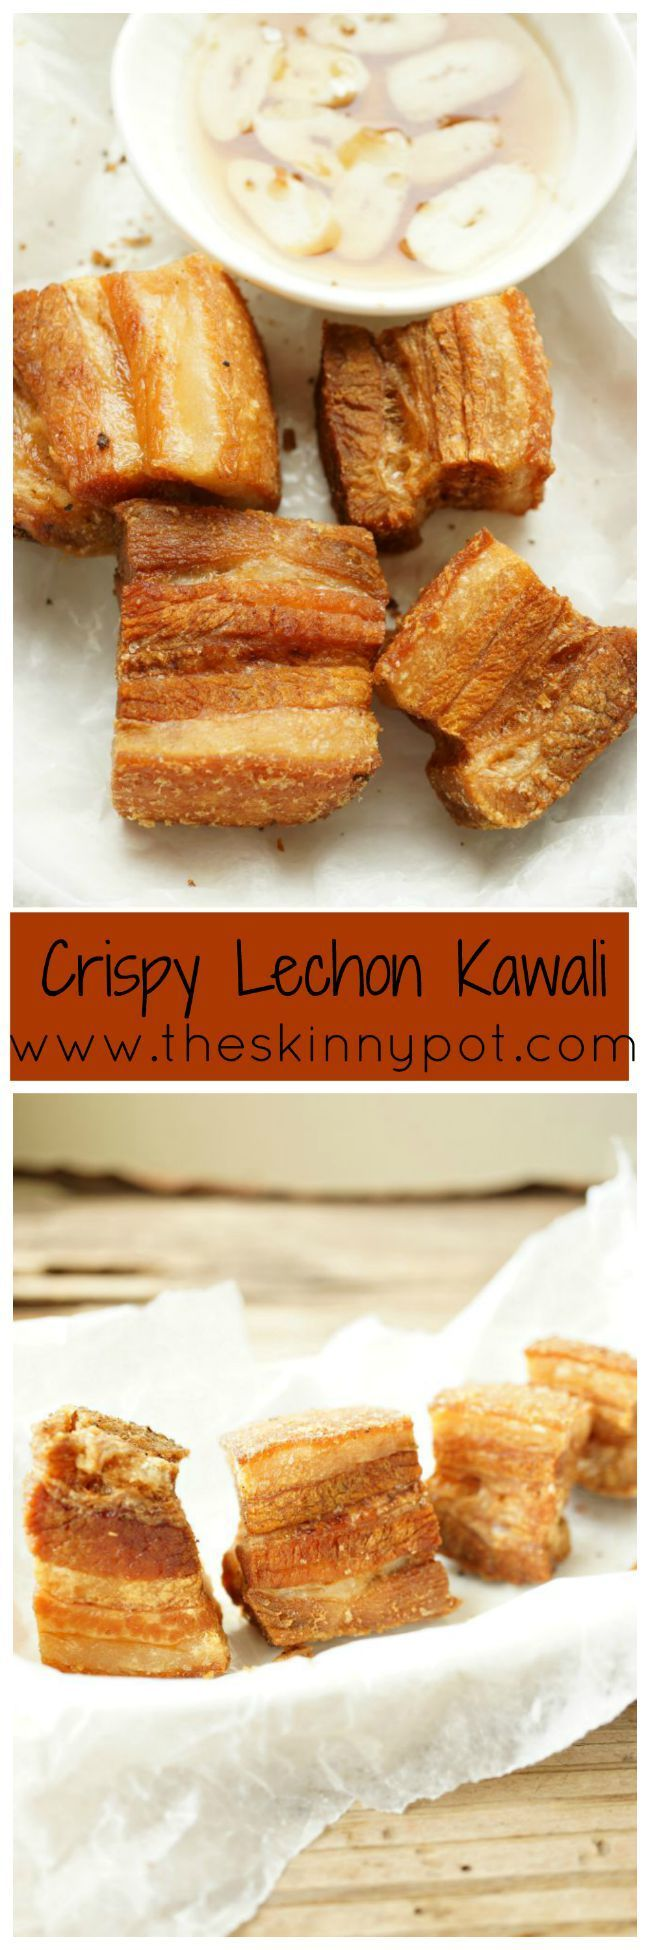 HOW TO COOK CRISPY LECHON KAWALI -FILIPINO CRISPY FRIED PORK BELLY